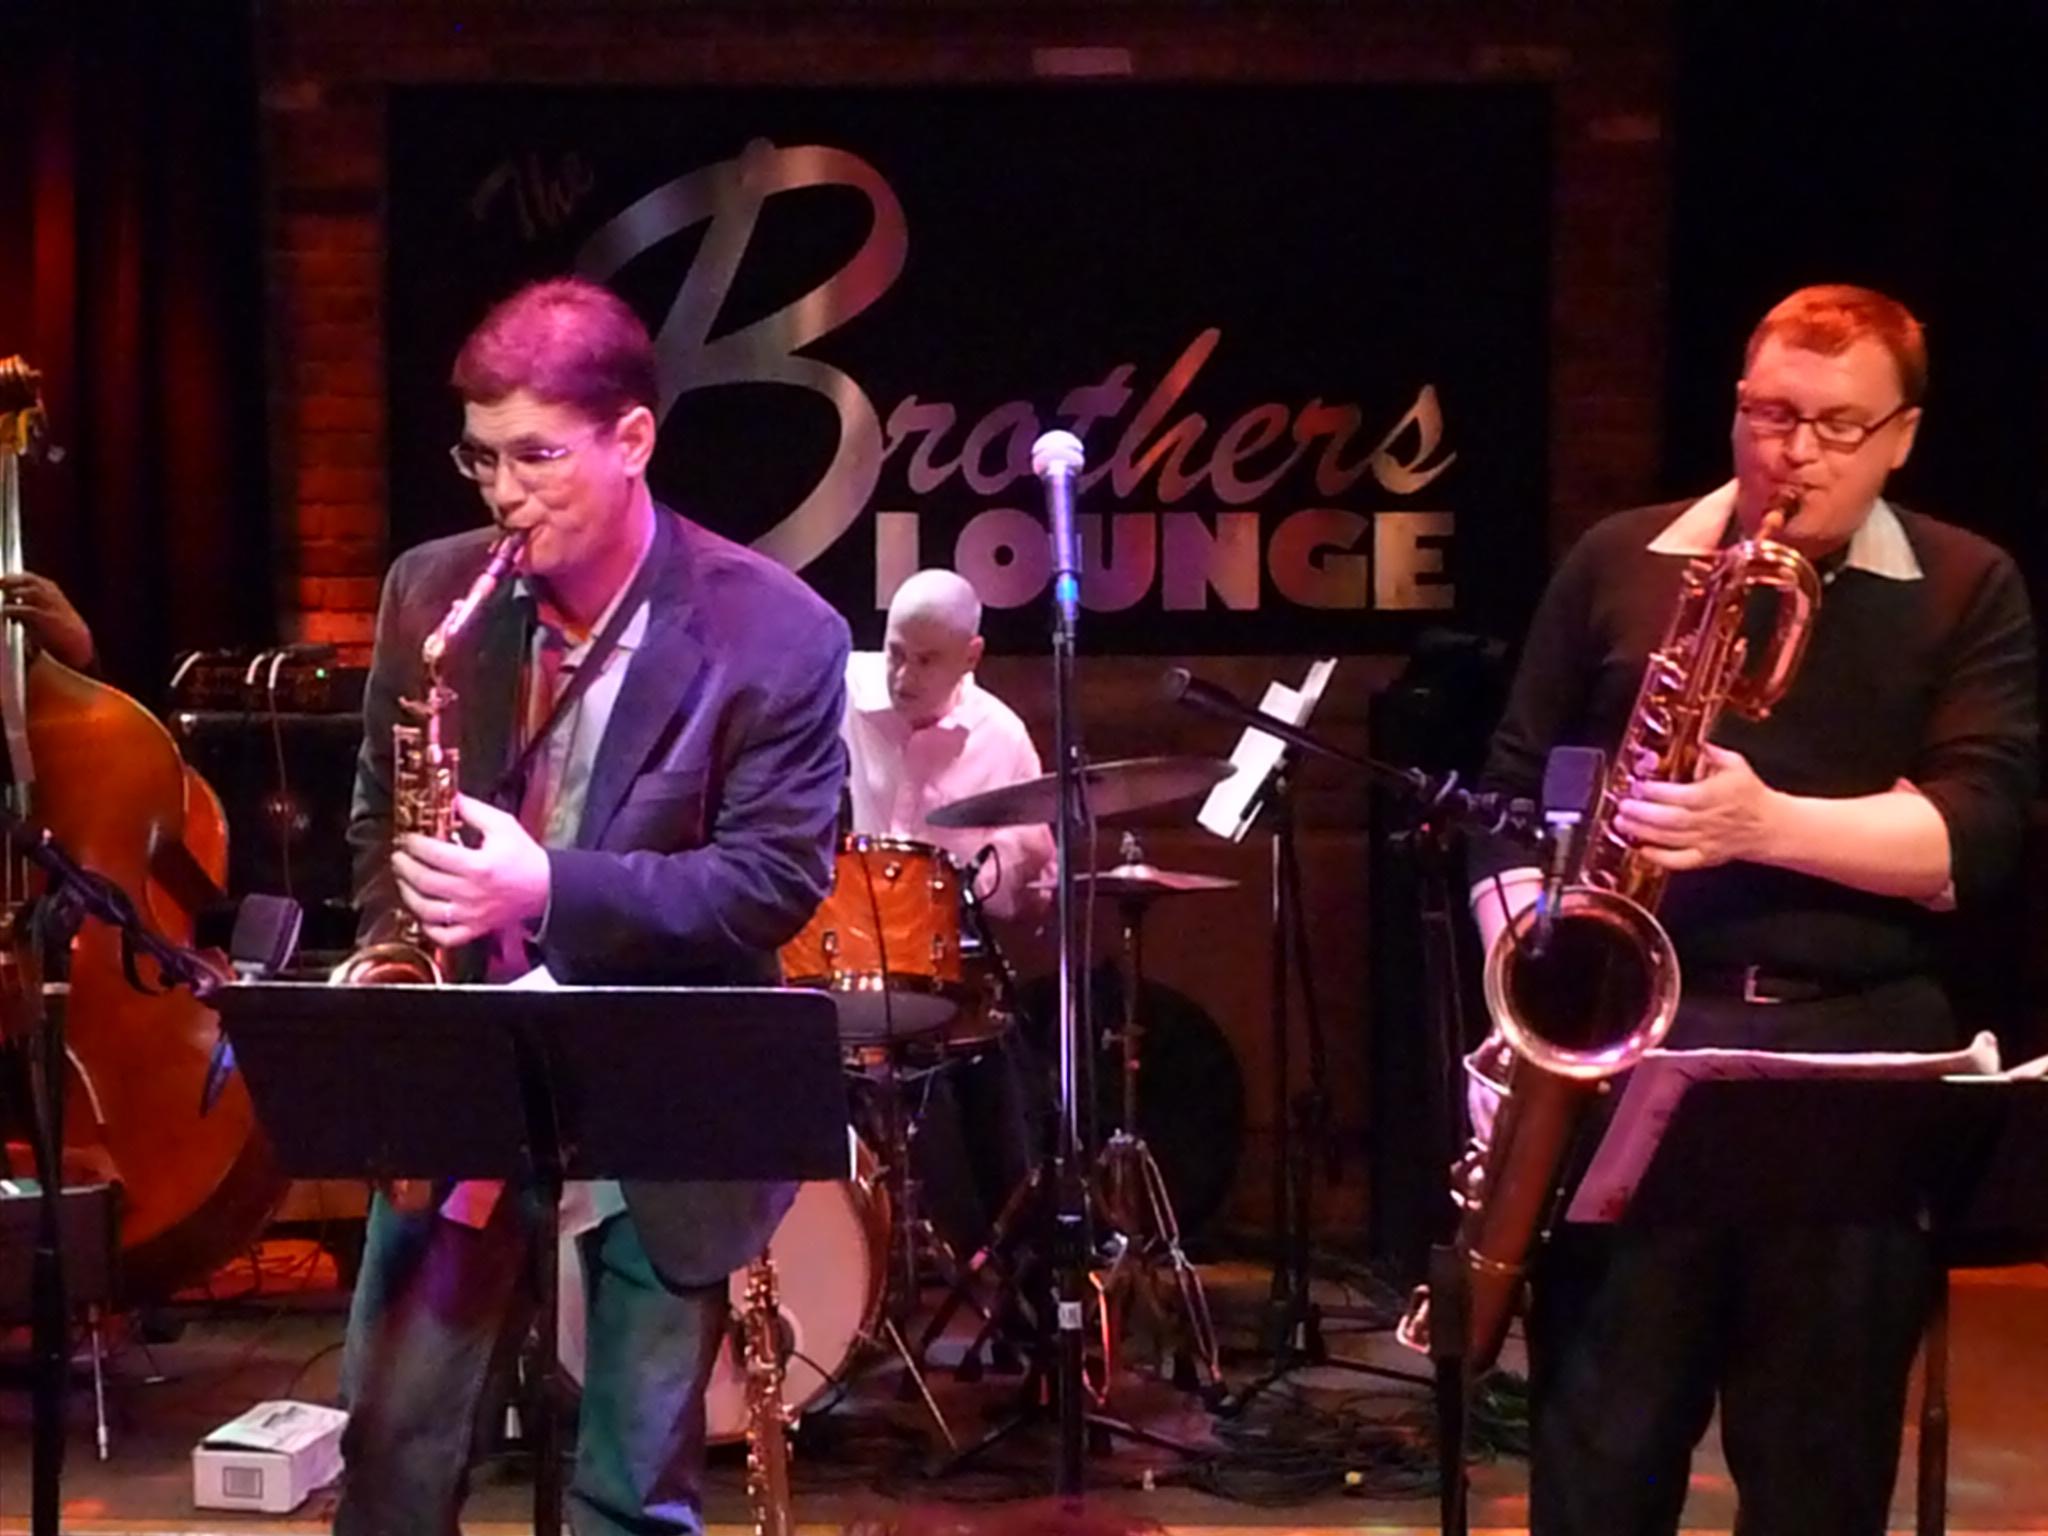 Dave Sterner, Paul Samuels and Chris Burge at Tri-C Jazzfest Cleveland 2011